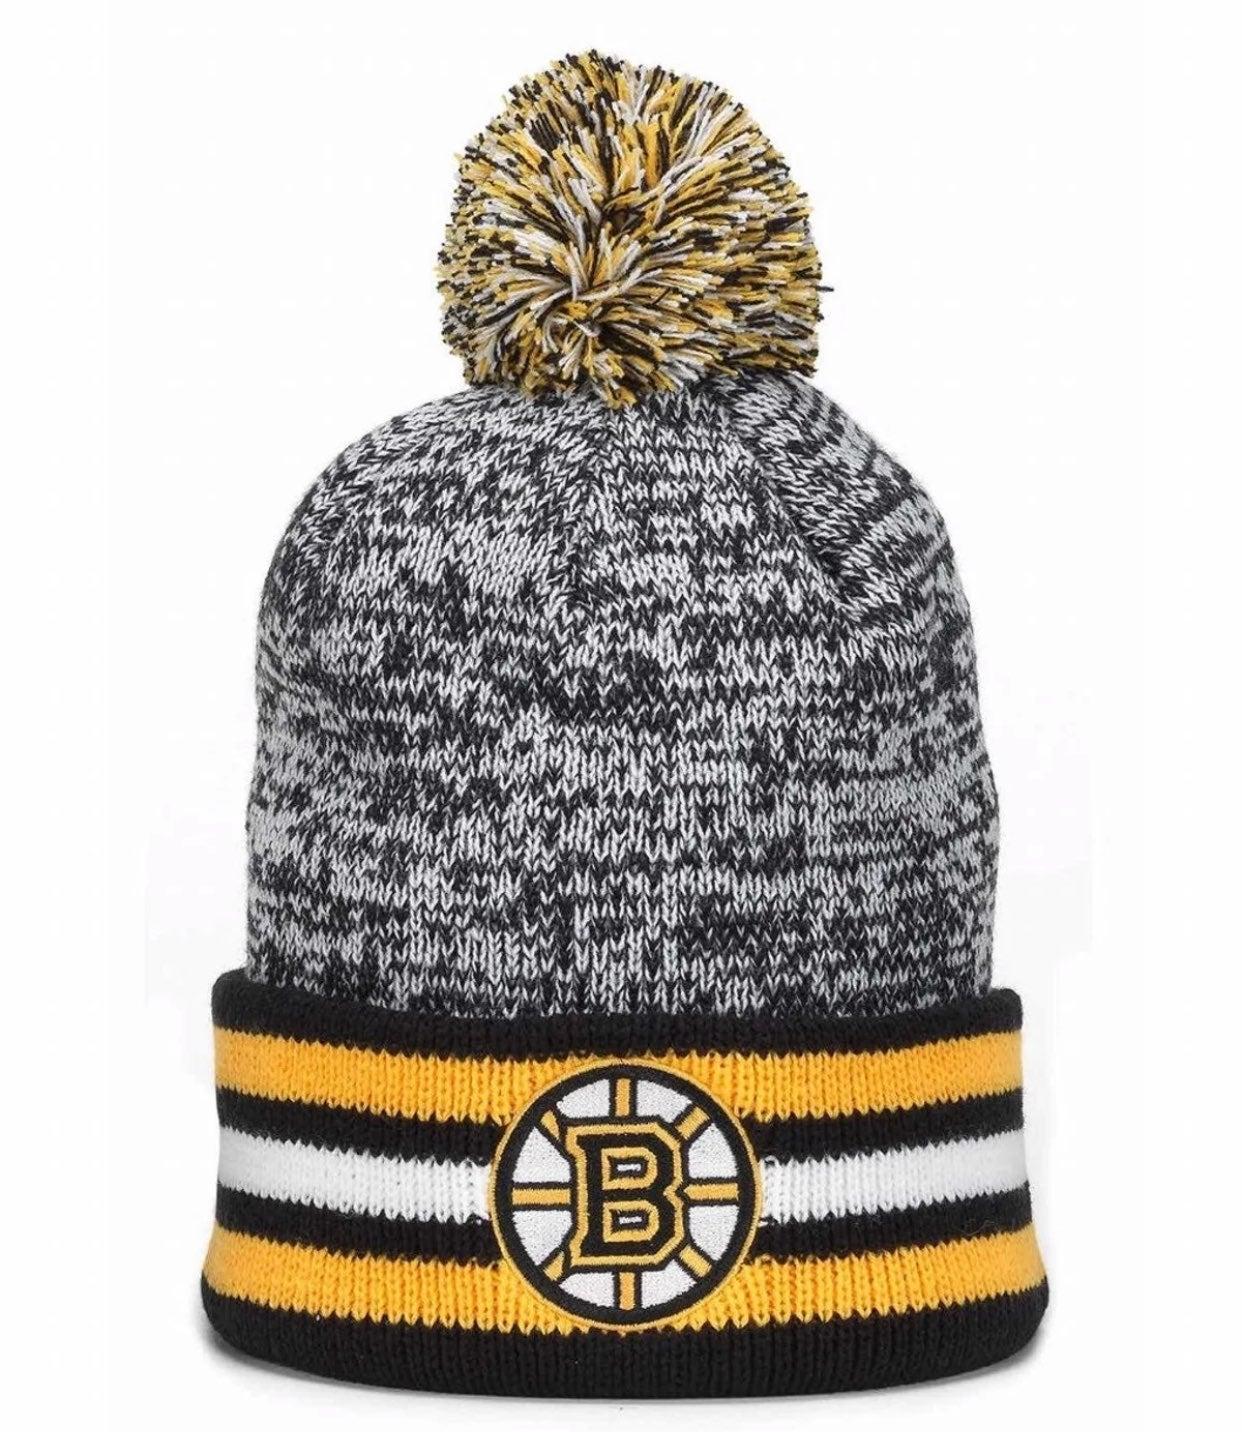 Boston Bruins Granite Beanie